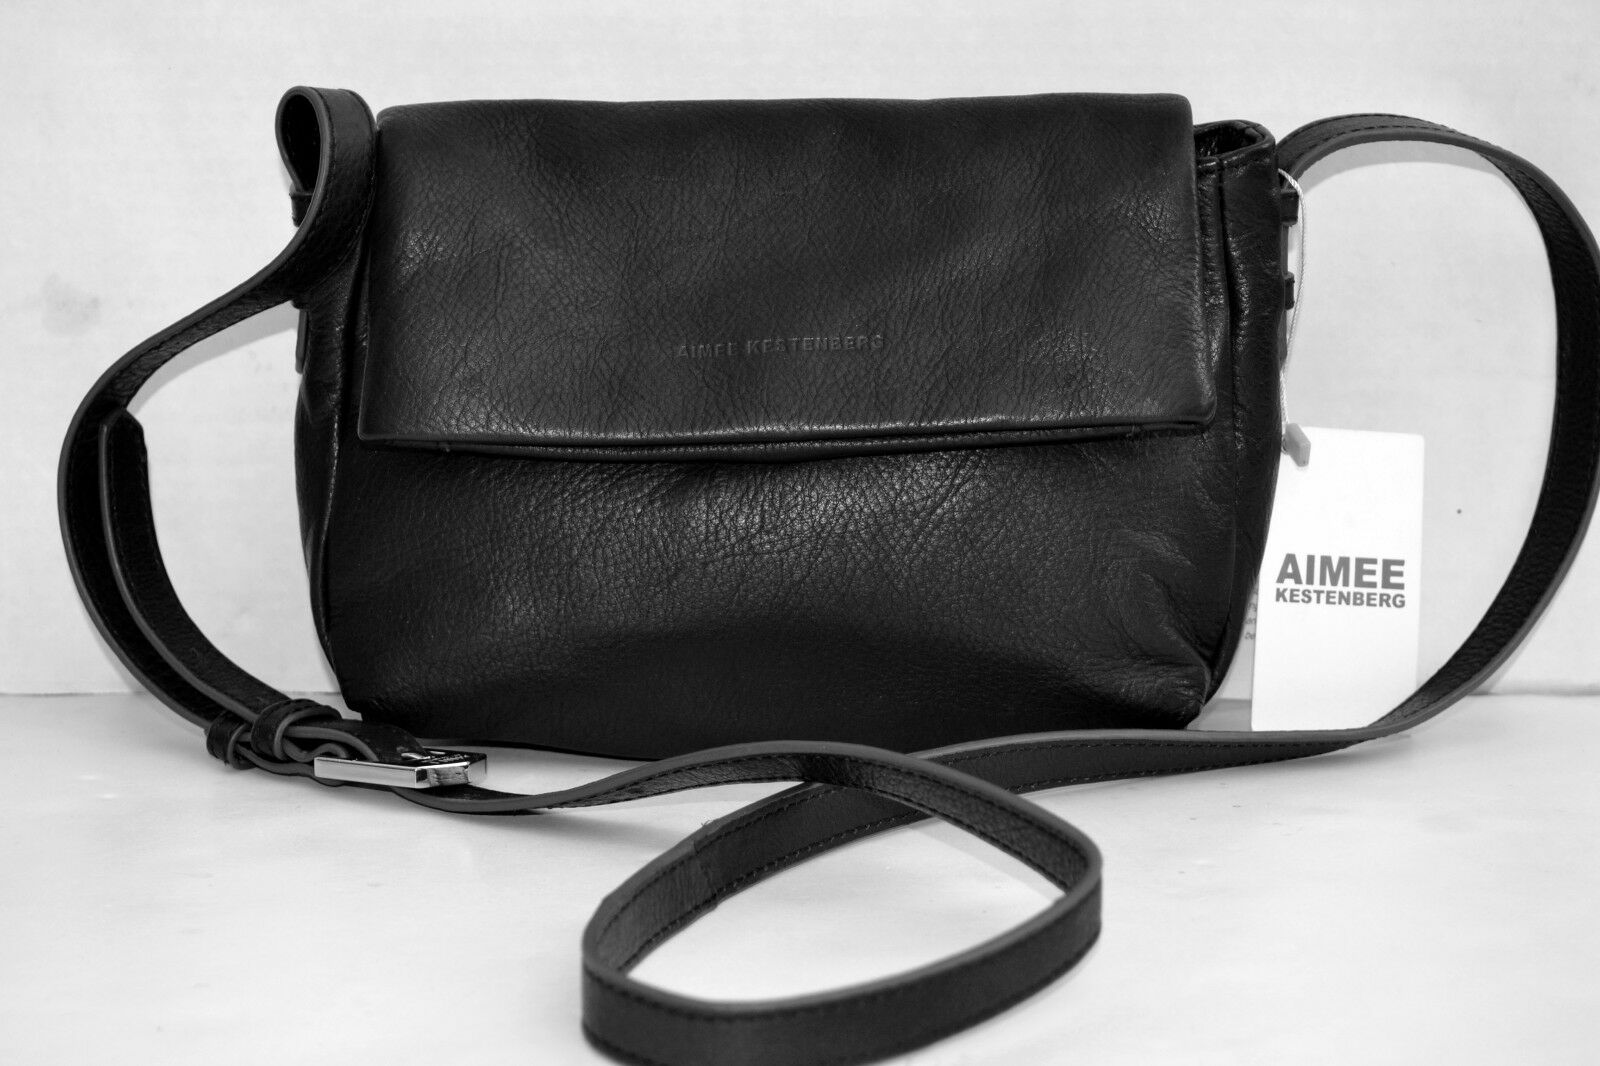 Aimee Kestenberg Bali Double Entry X-body Bag Handbag Leathe